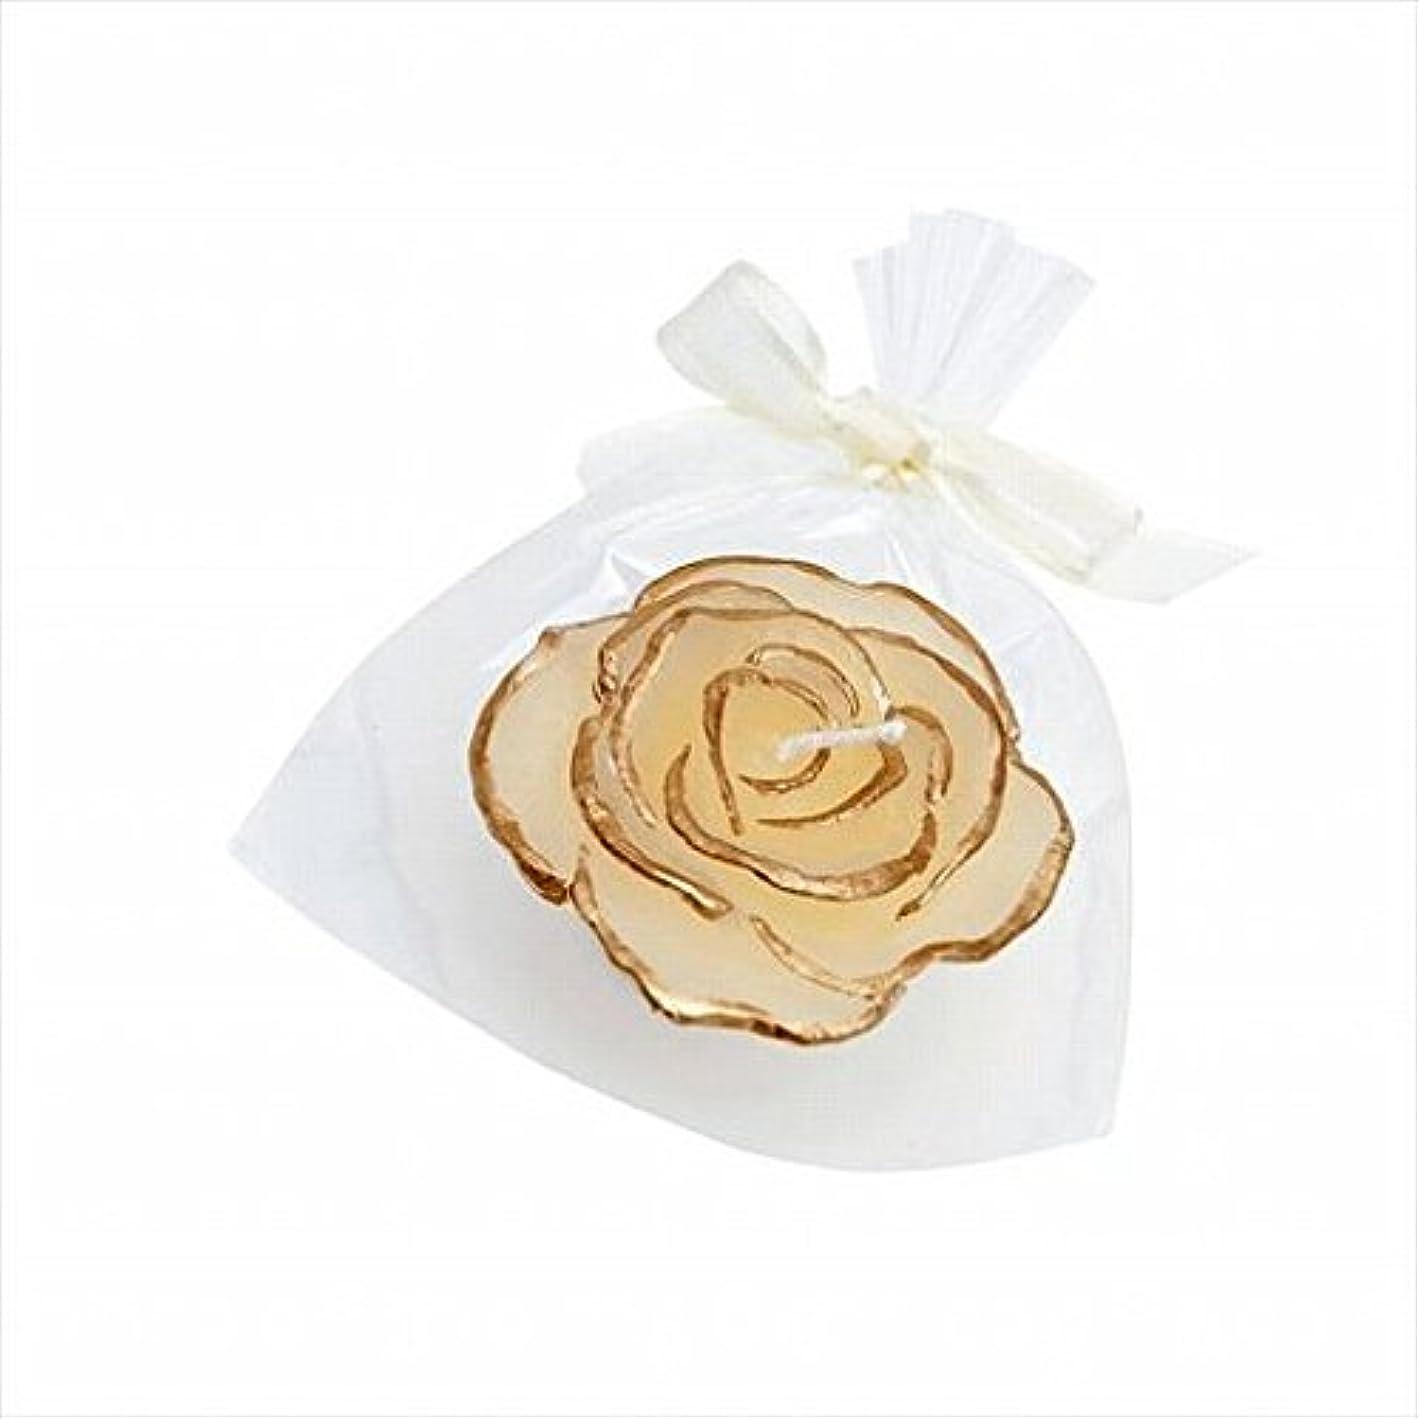 kameyama candle(カメヤマキャンドル) プリンセスローズ 「 アイボリー 」(A6390500IV)